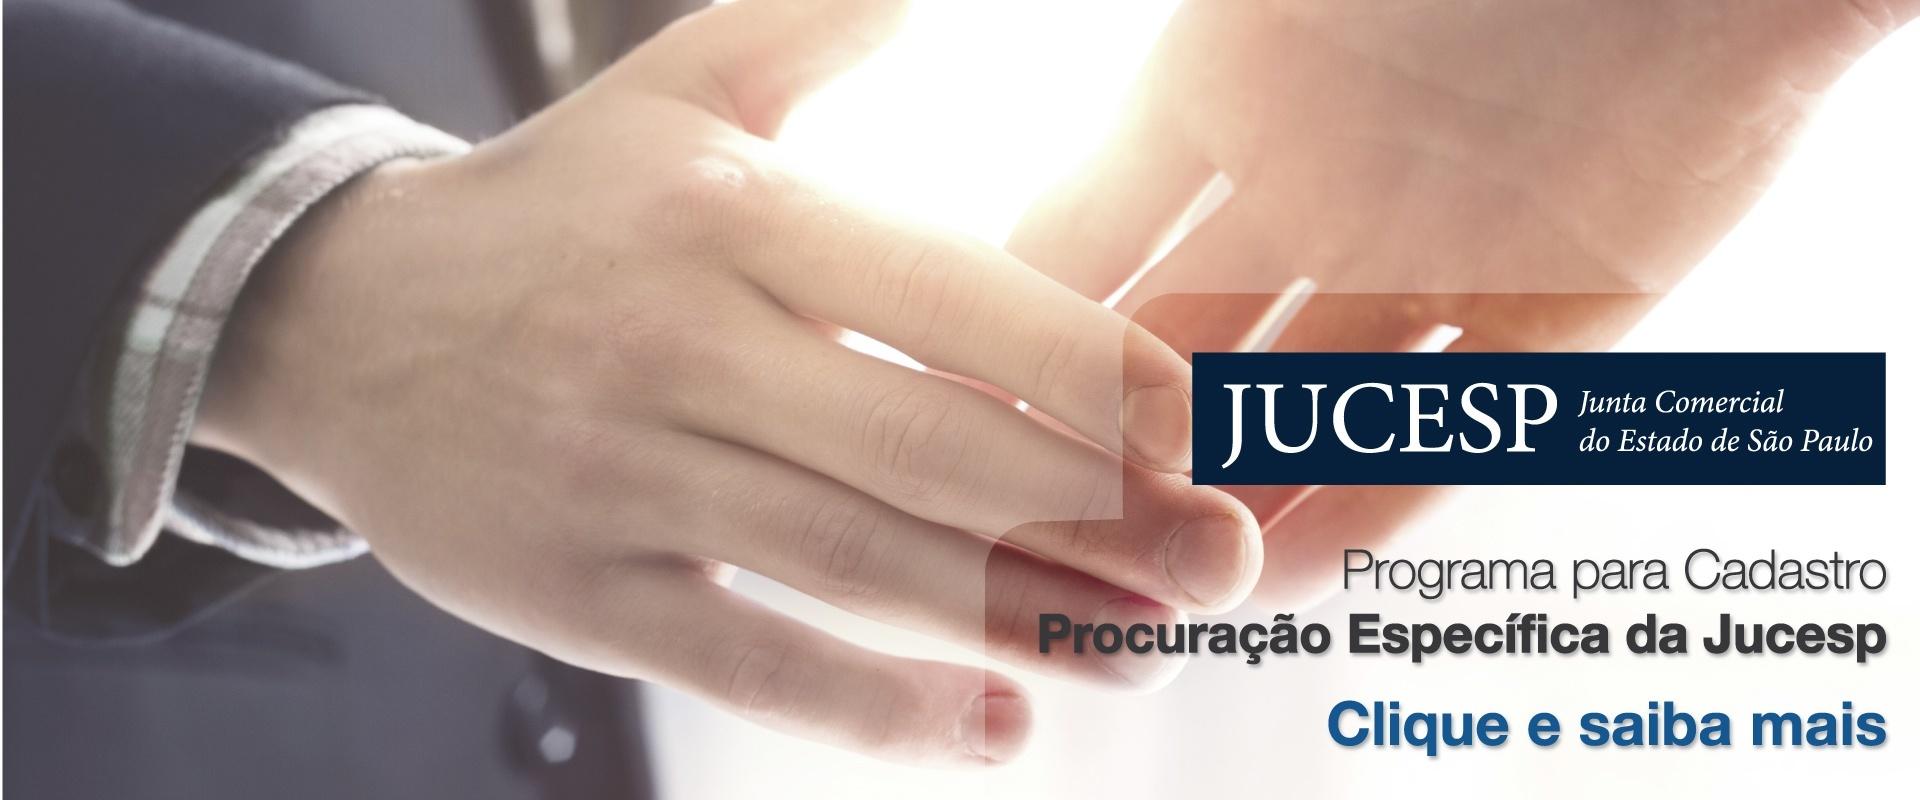 MKT-procuracao-especifica-da-jucesp